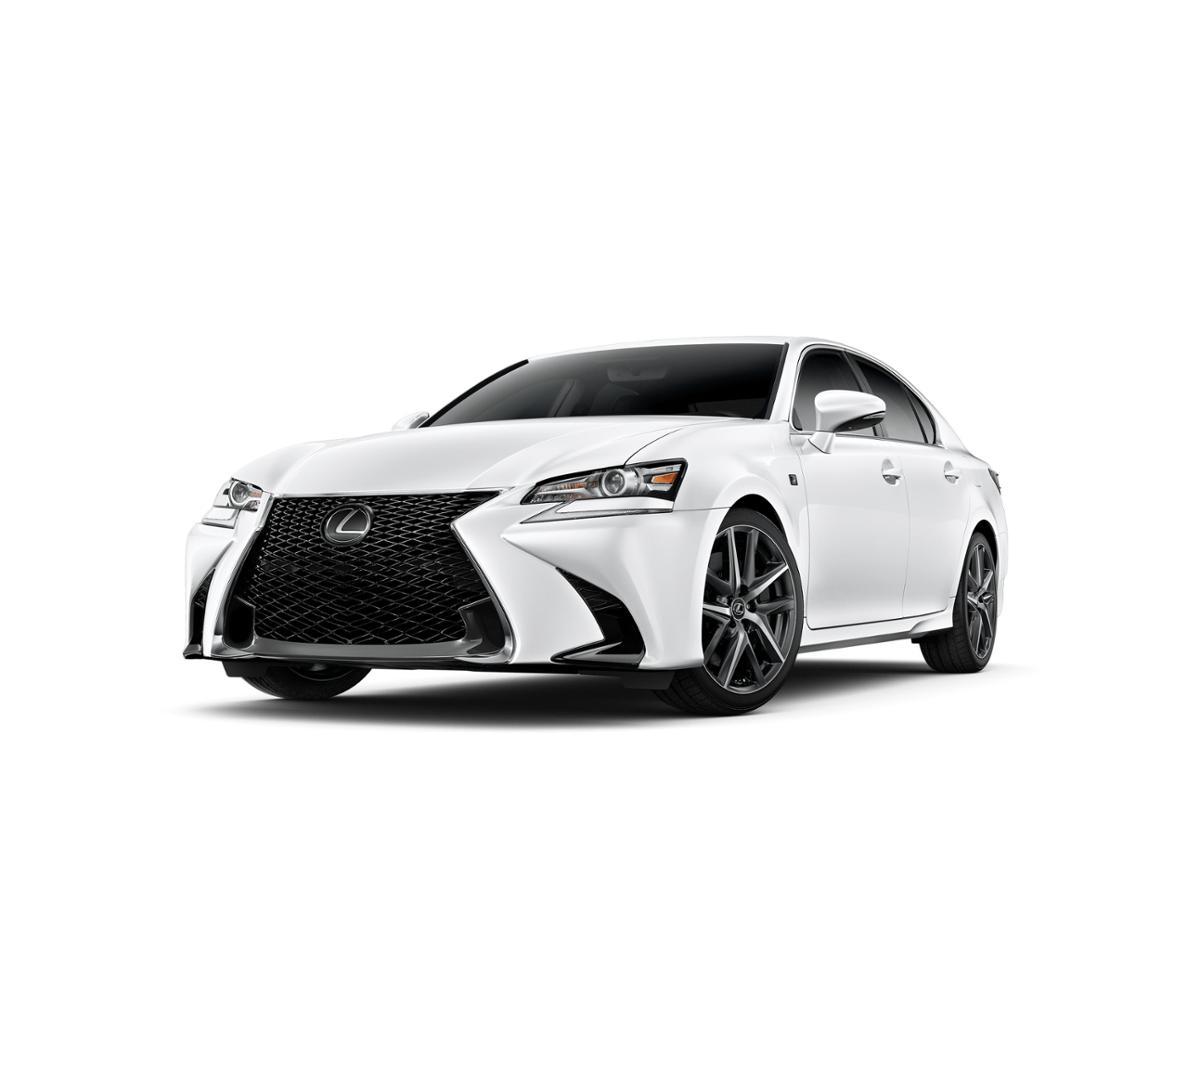 2014 Lexus Is F Sport For Sale: Search Lexus Vehicles